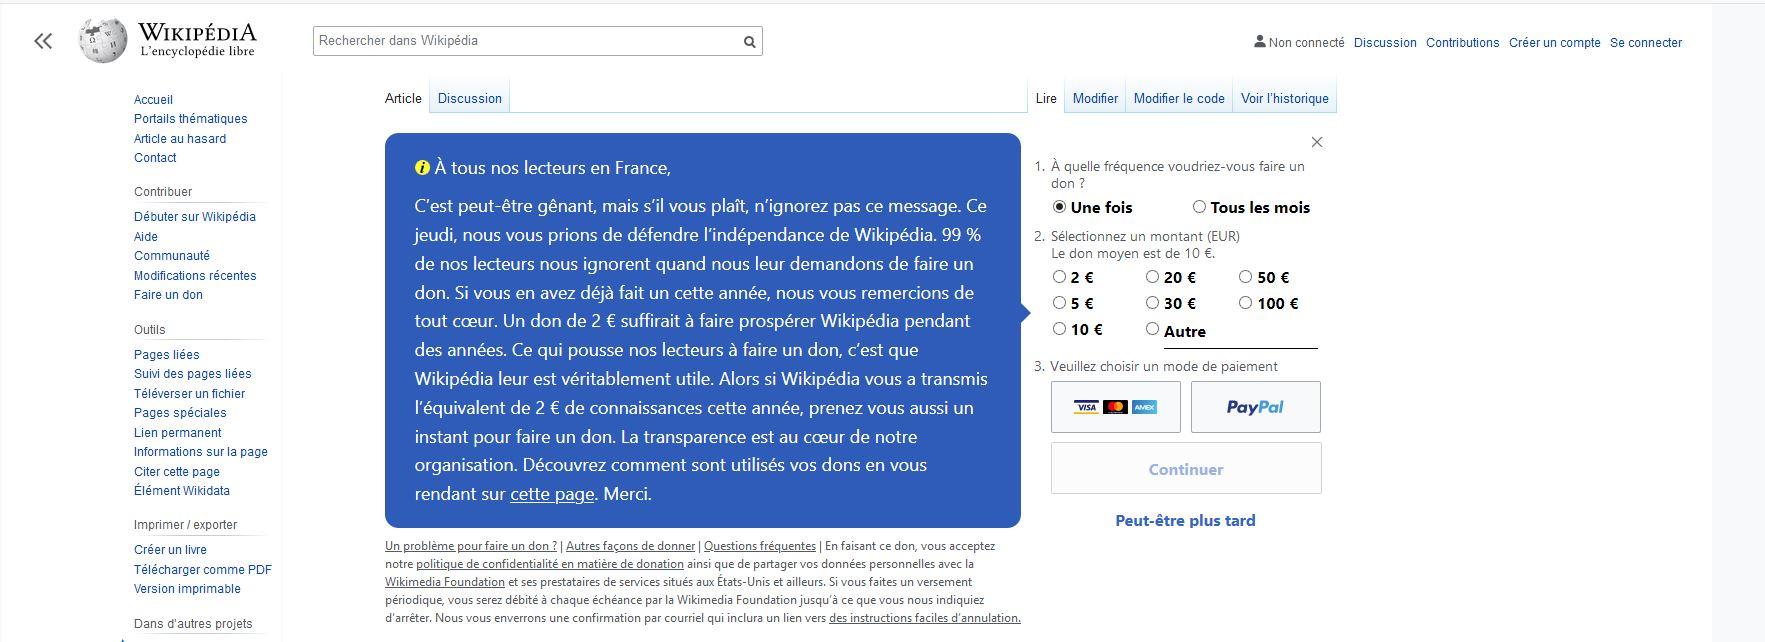 Soutien financier à Wikipedia [Le village de TSGE] Tsge1690